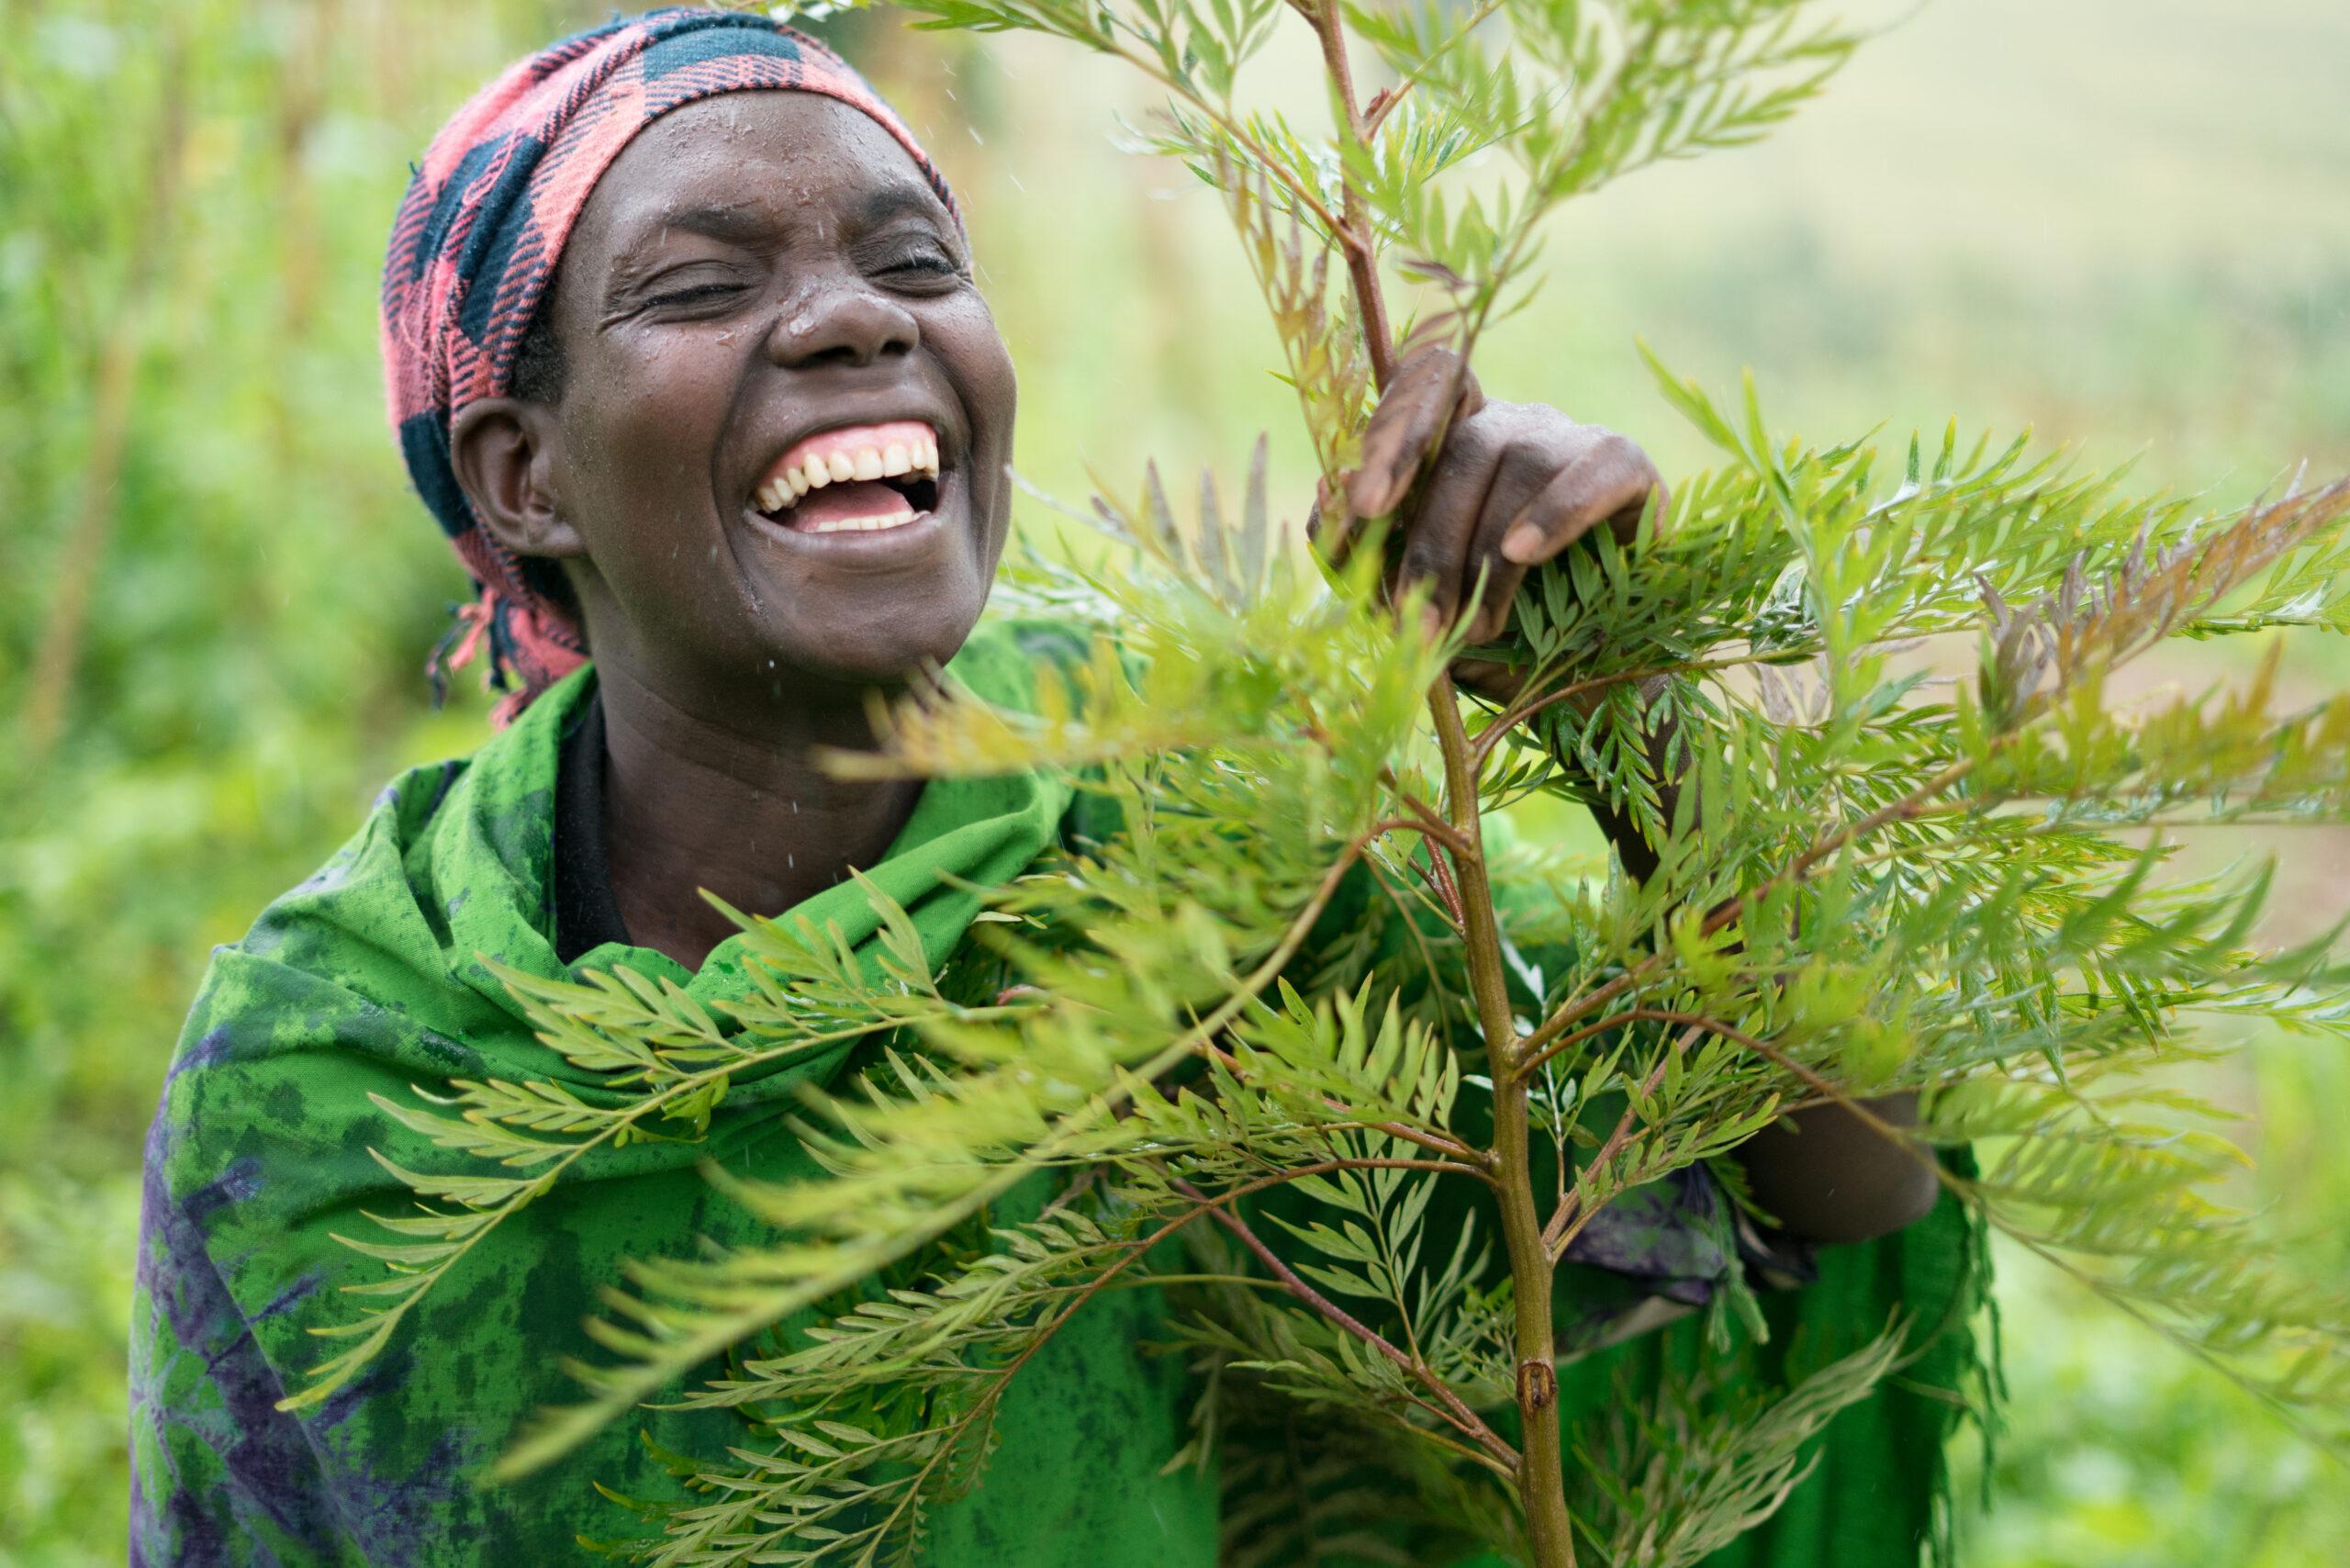 Marie Claire Kabaganwa. Photo Elin Larsson.